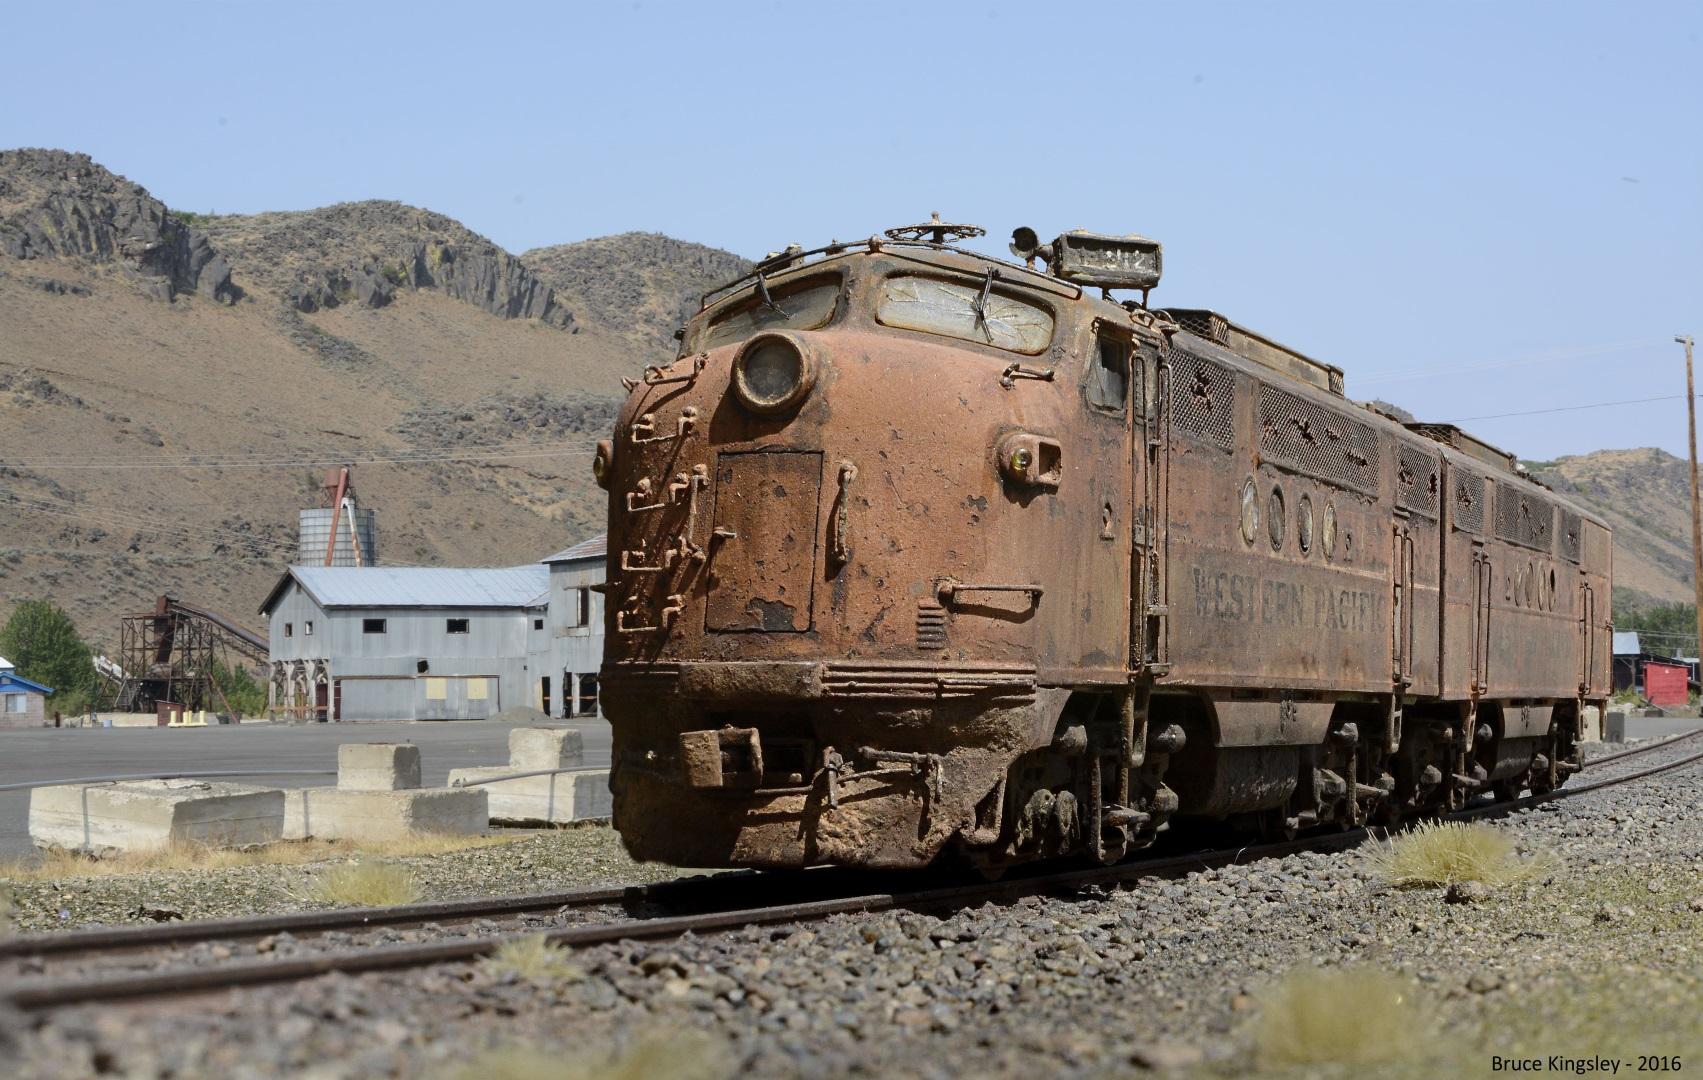 How To Find House Plans Online Abandoned Wp Fta B Units 1 Model Railroader Magazine